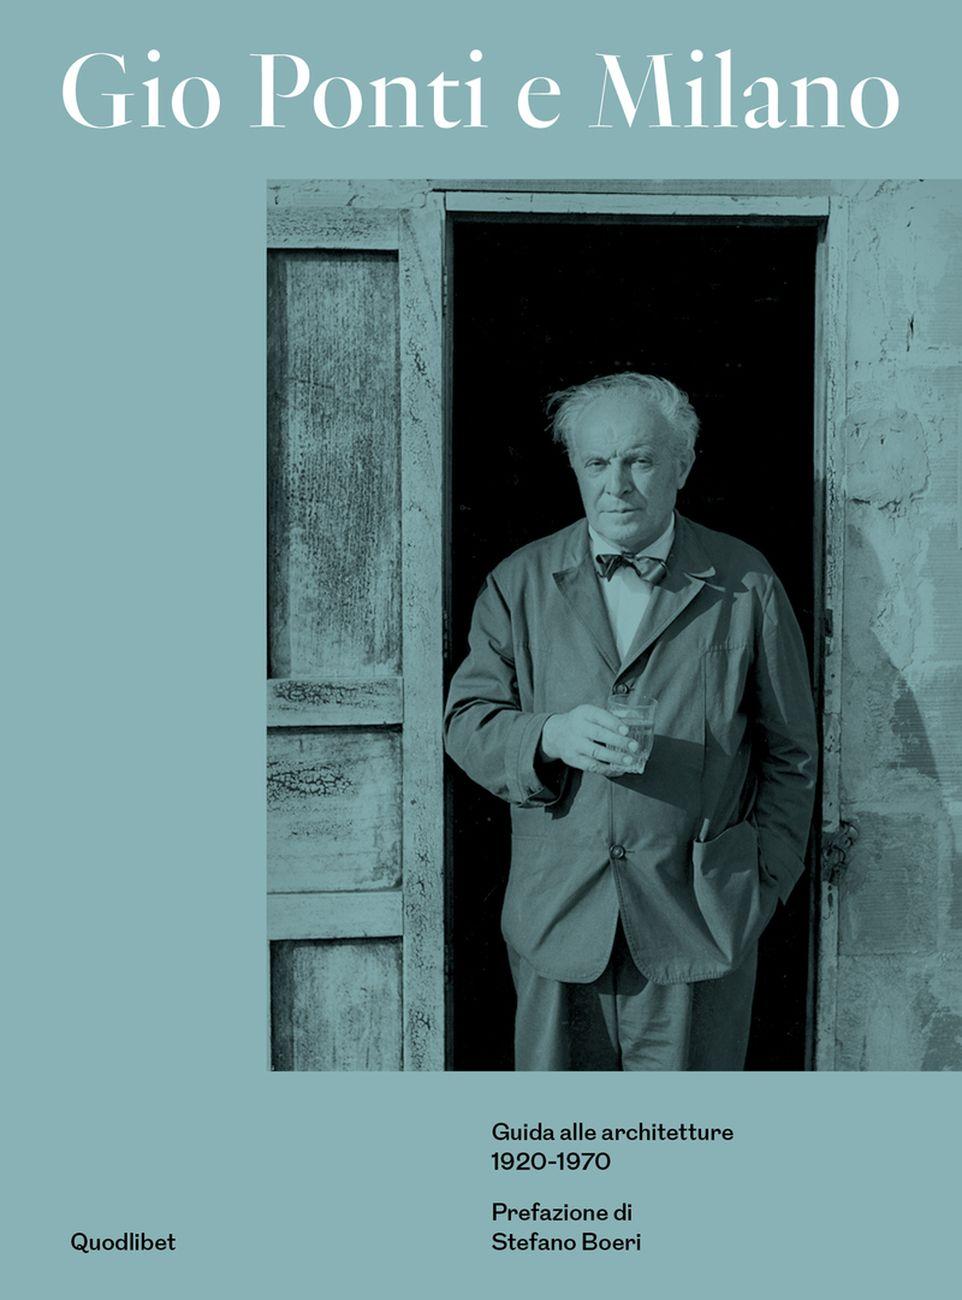 Gio Ponti e Milano. Guida alle architetture 1920-1970 (Quodlibet, Macerata 2018)